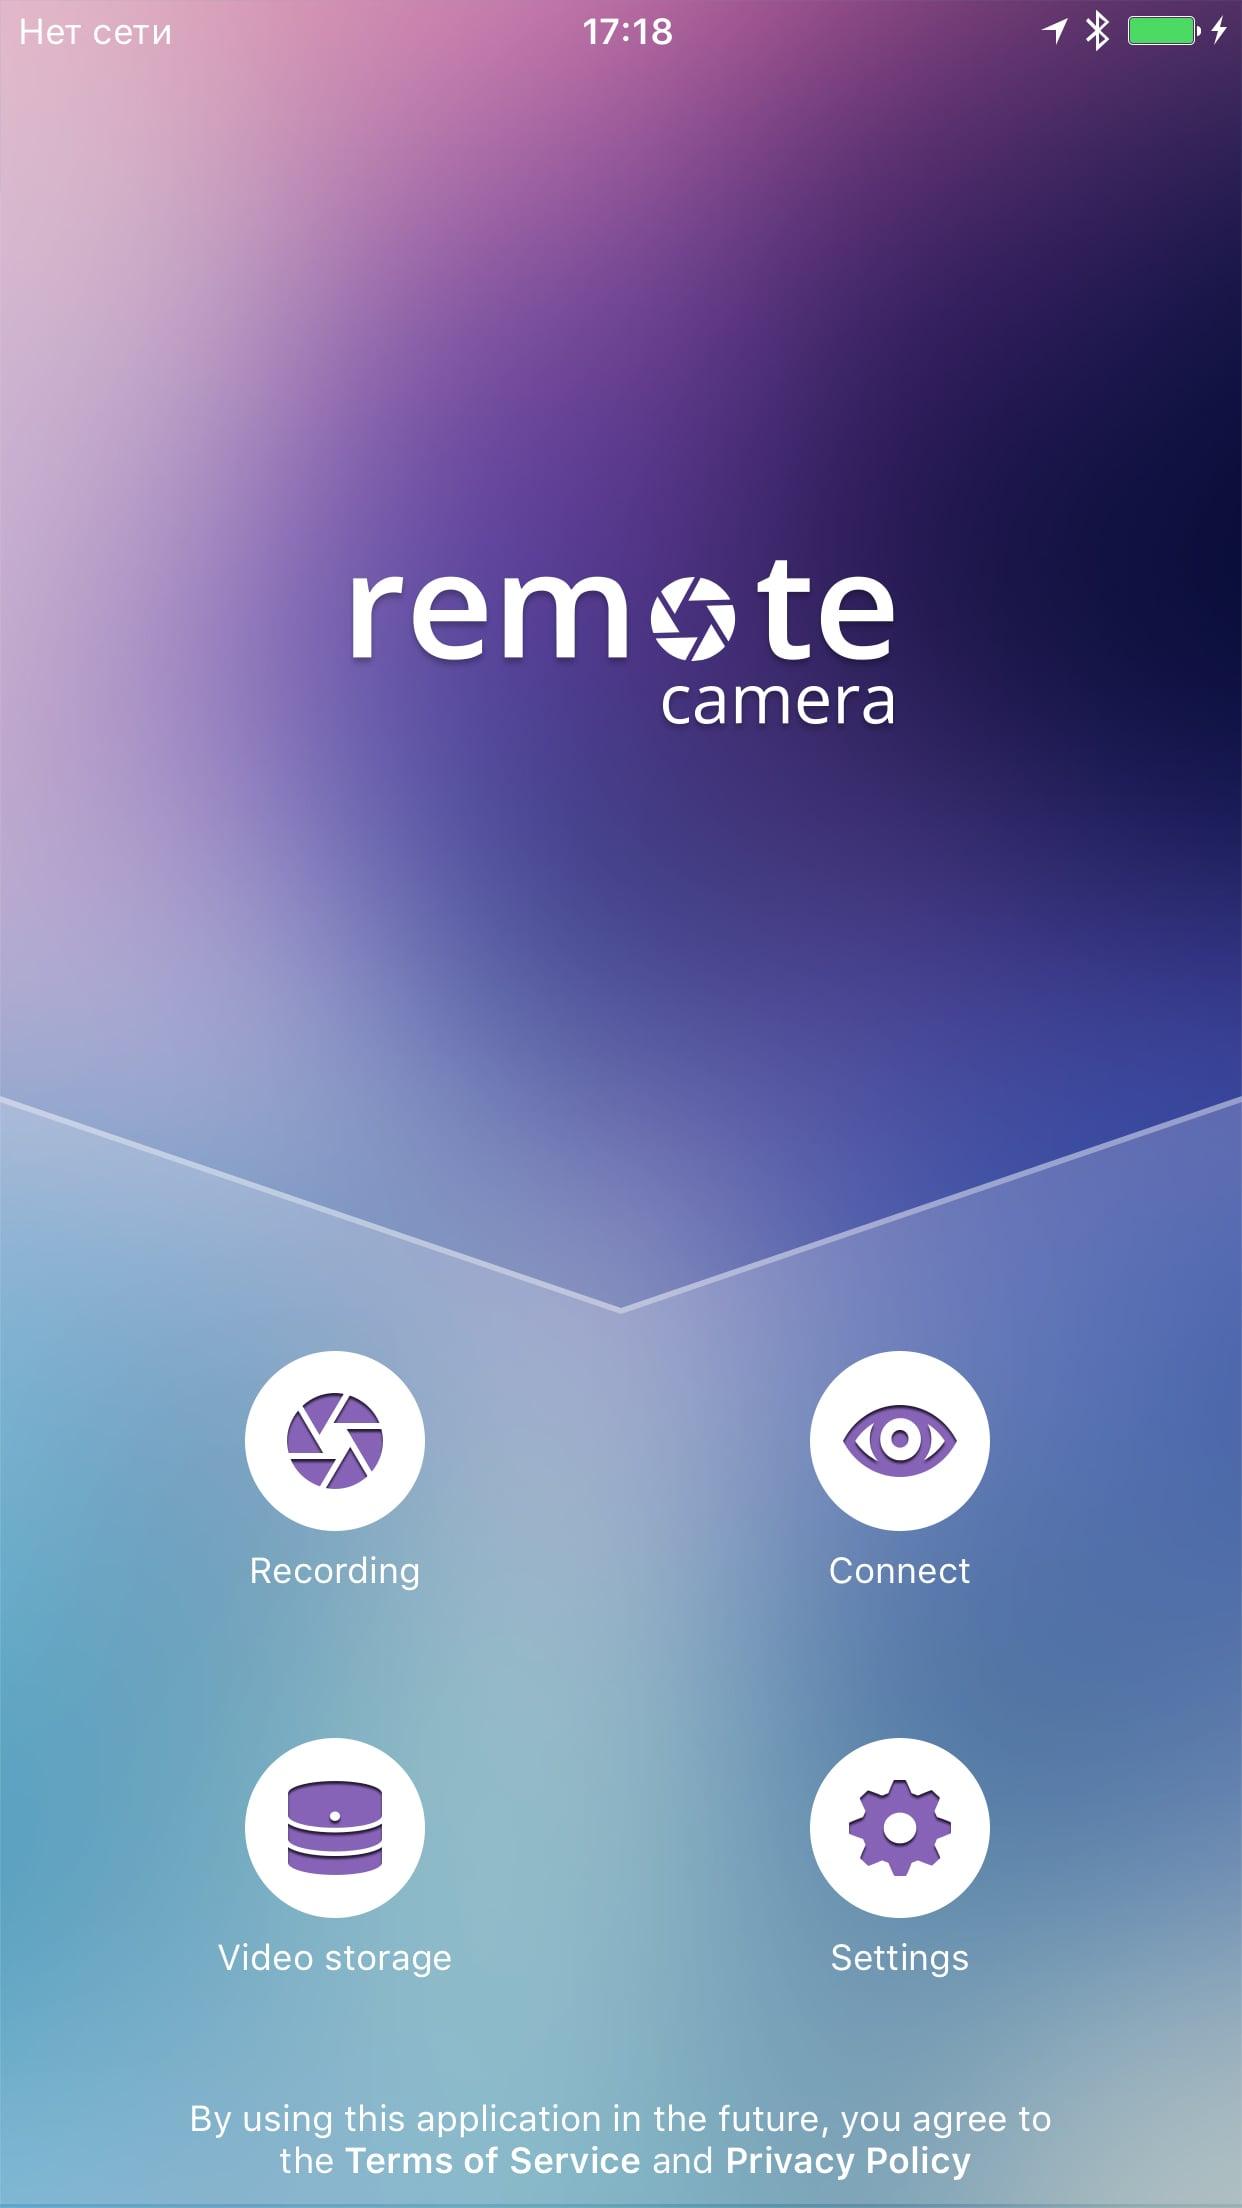 RemoteCam menu page